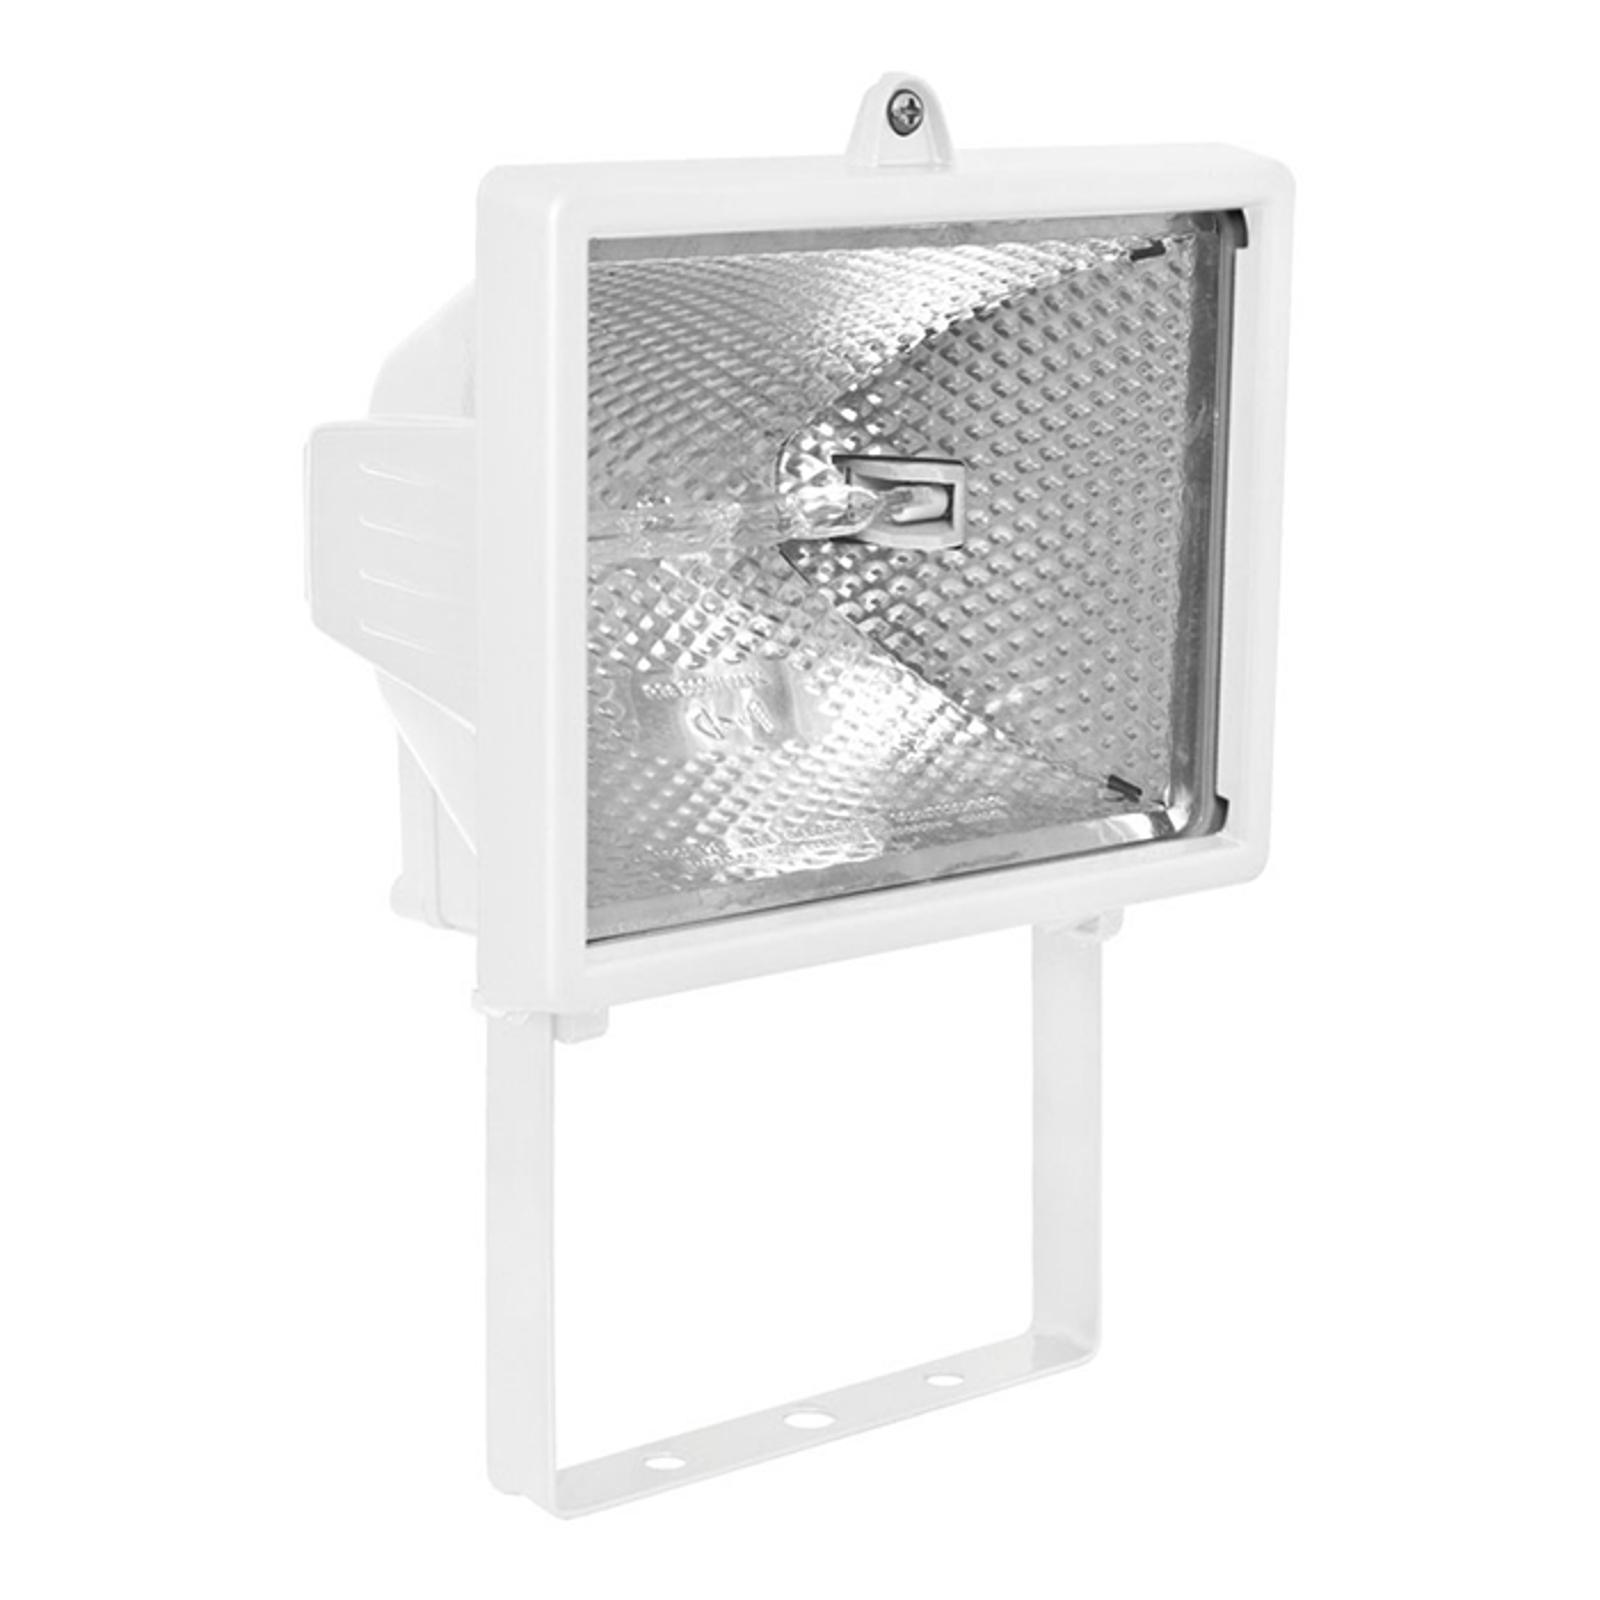 Svingbar 400W udendørs projektør POWER II hvid